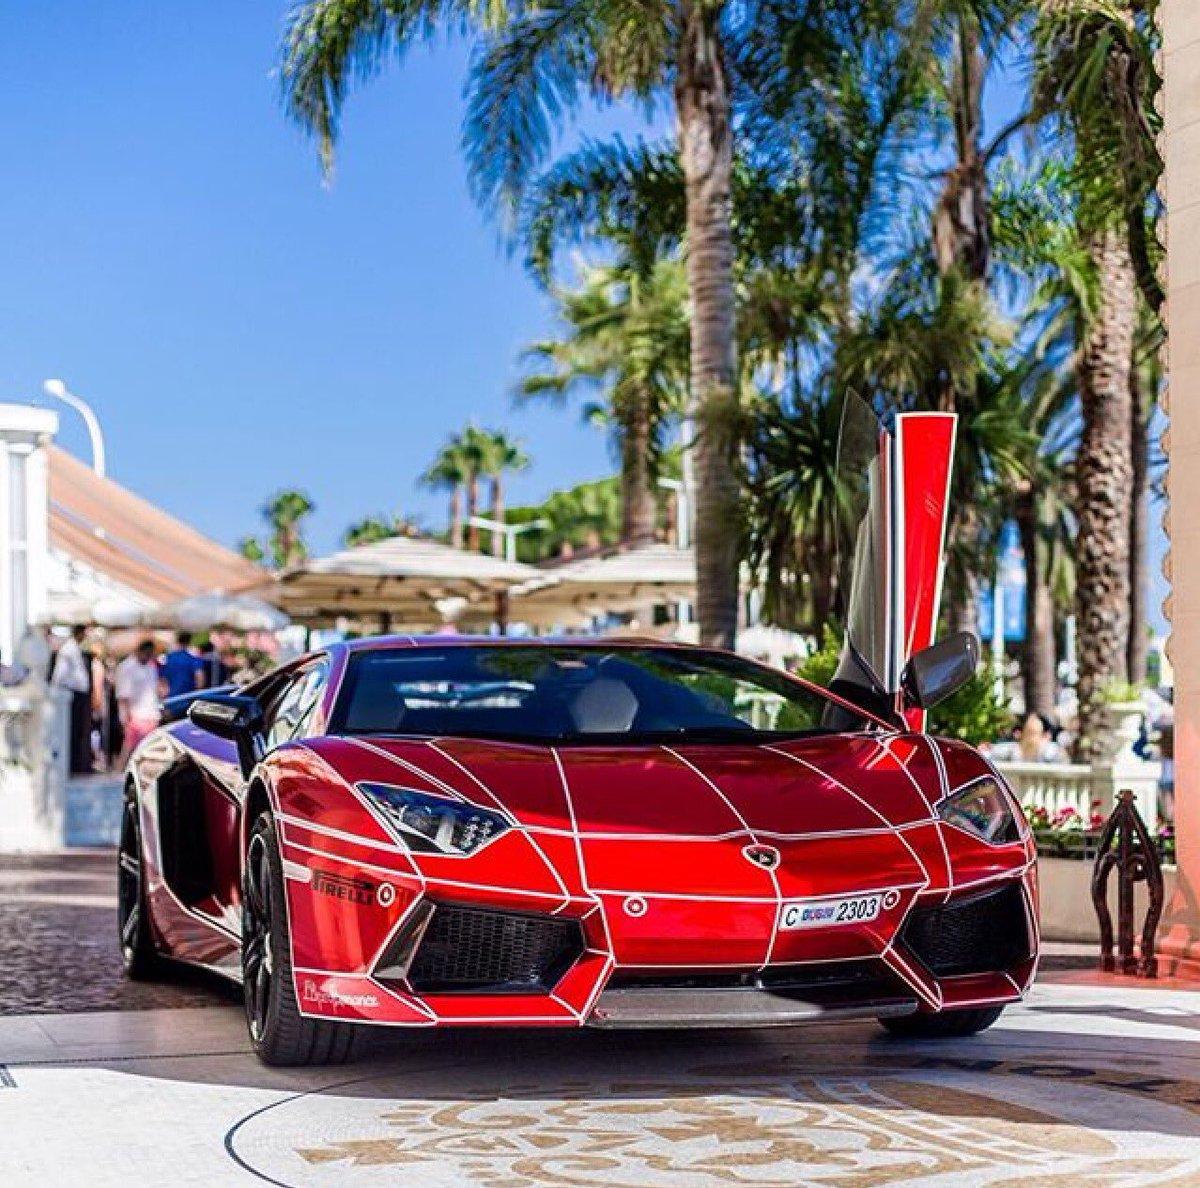 Autodrive On Twitter Amazing Chrome Red Lamborghini Aventador